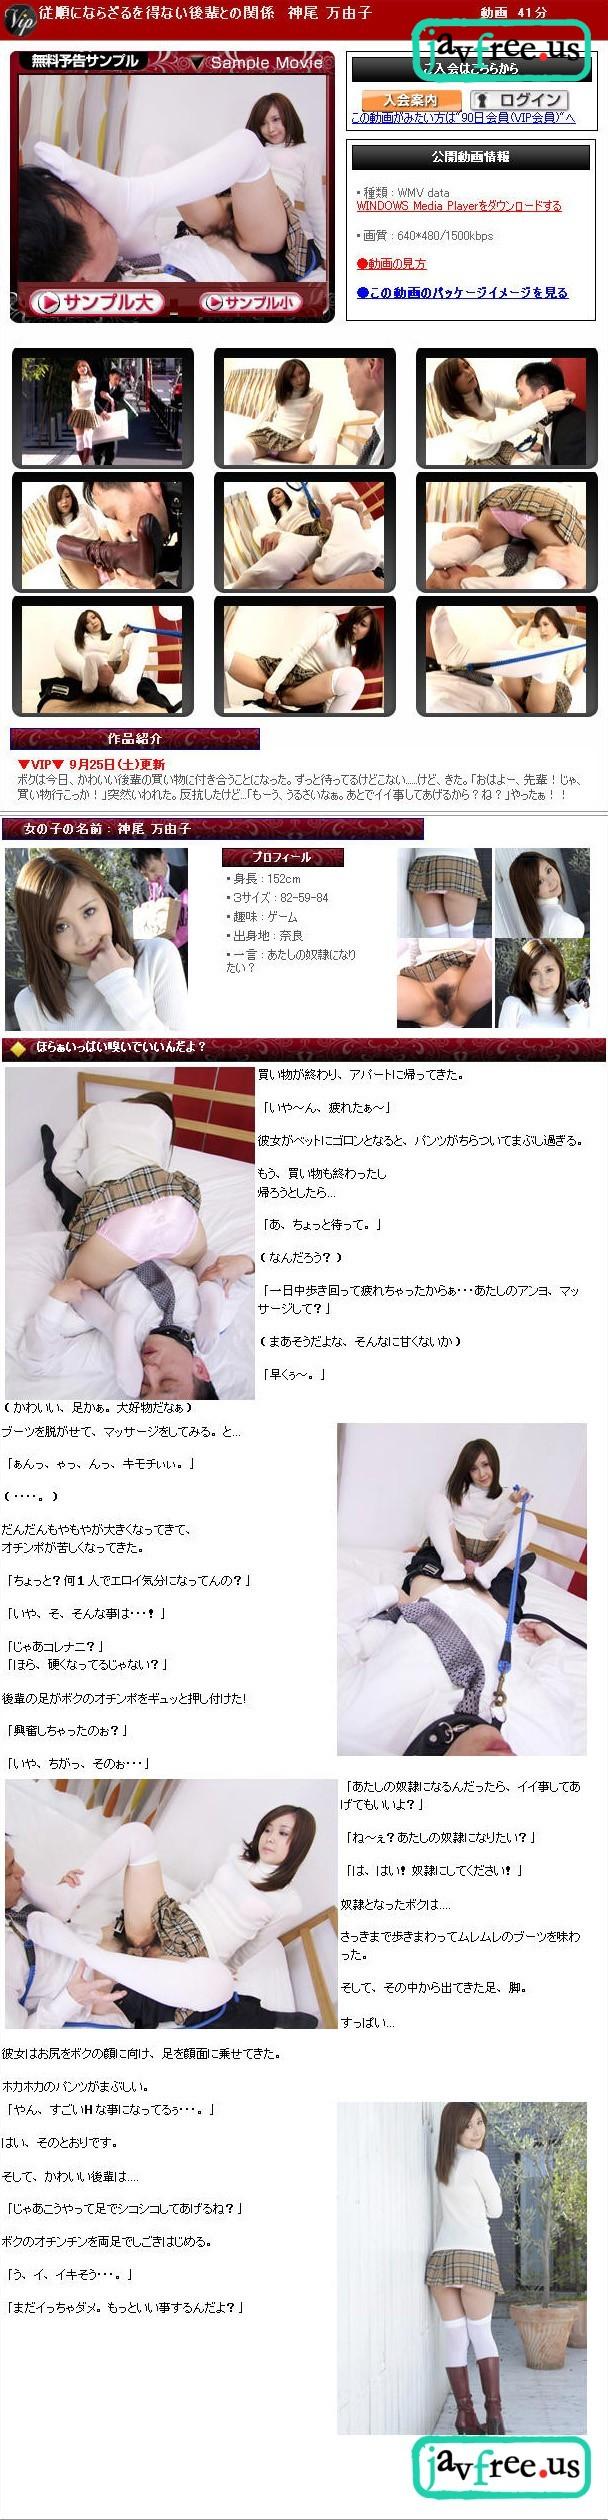 Roselip 0351 従順にならざるを得ない後輩との関係 神尾 万由子 - image Roselip-0351 on https://javfree.me